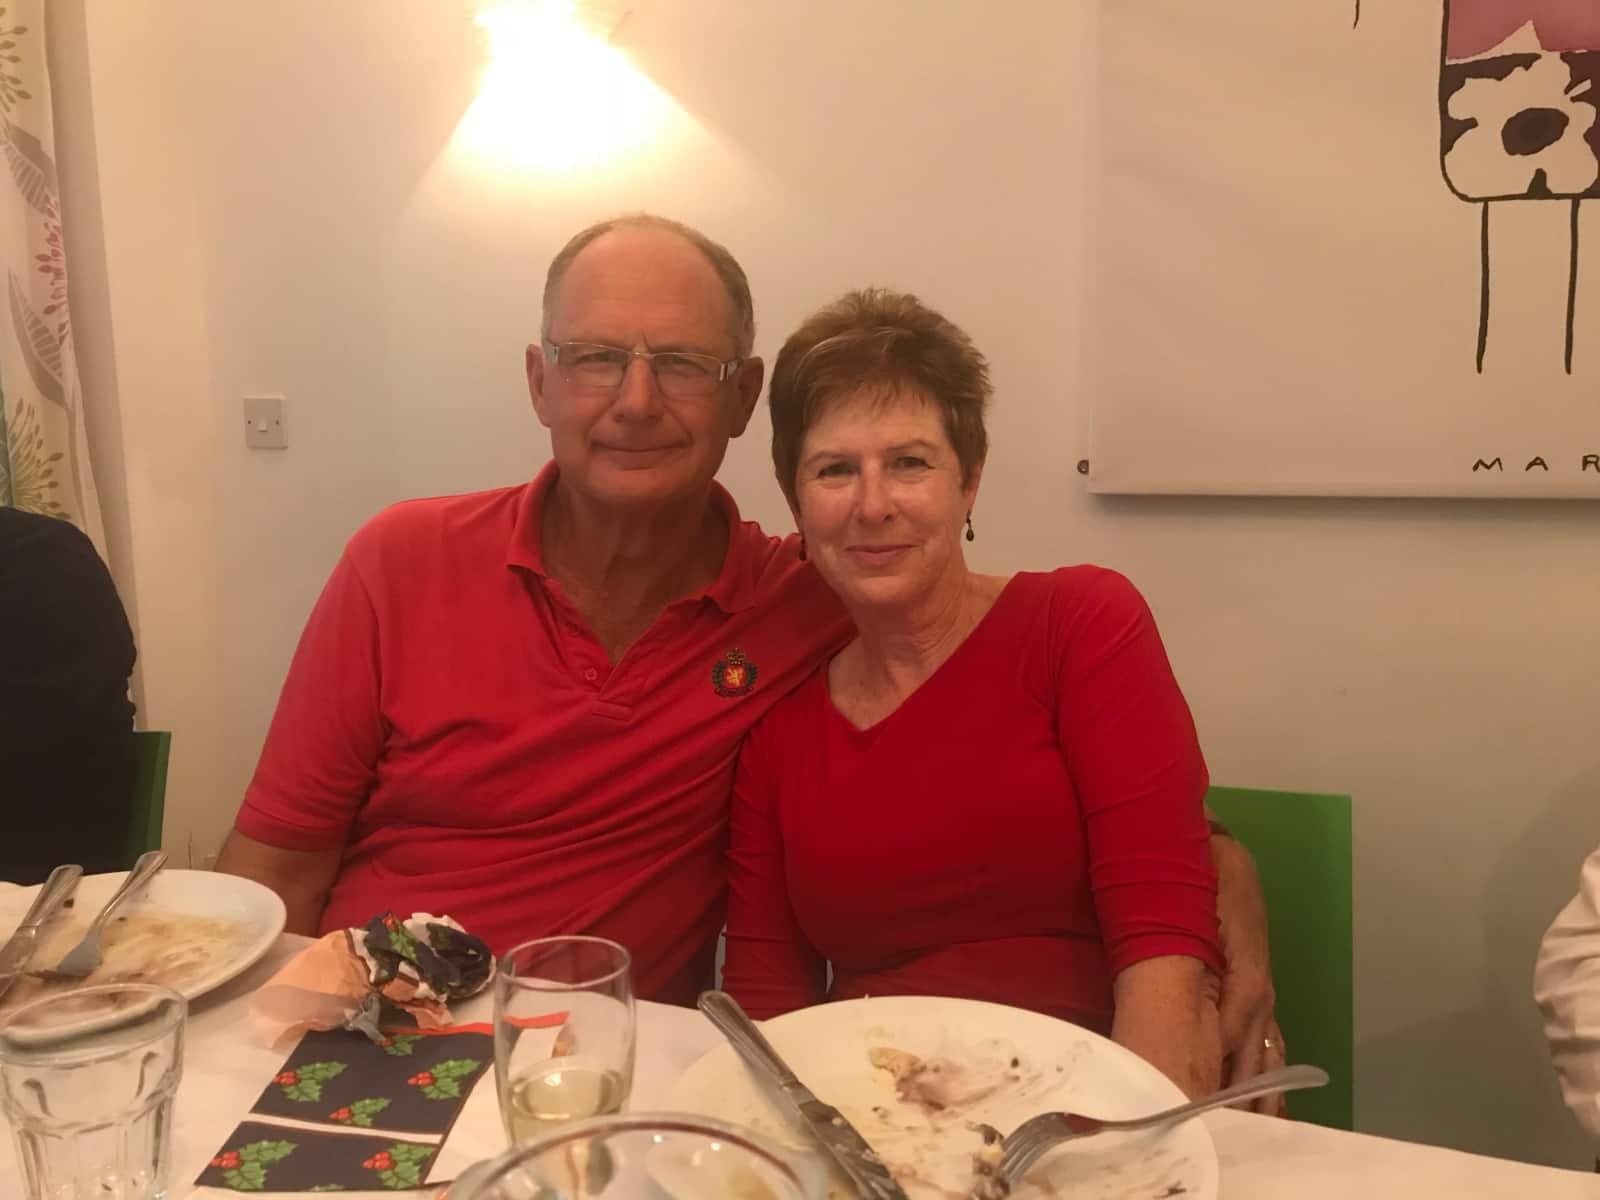 Denise & Steve from Poole, United Kingdom